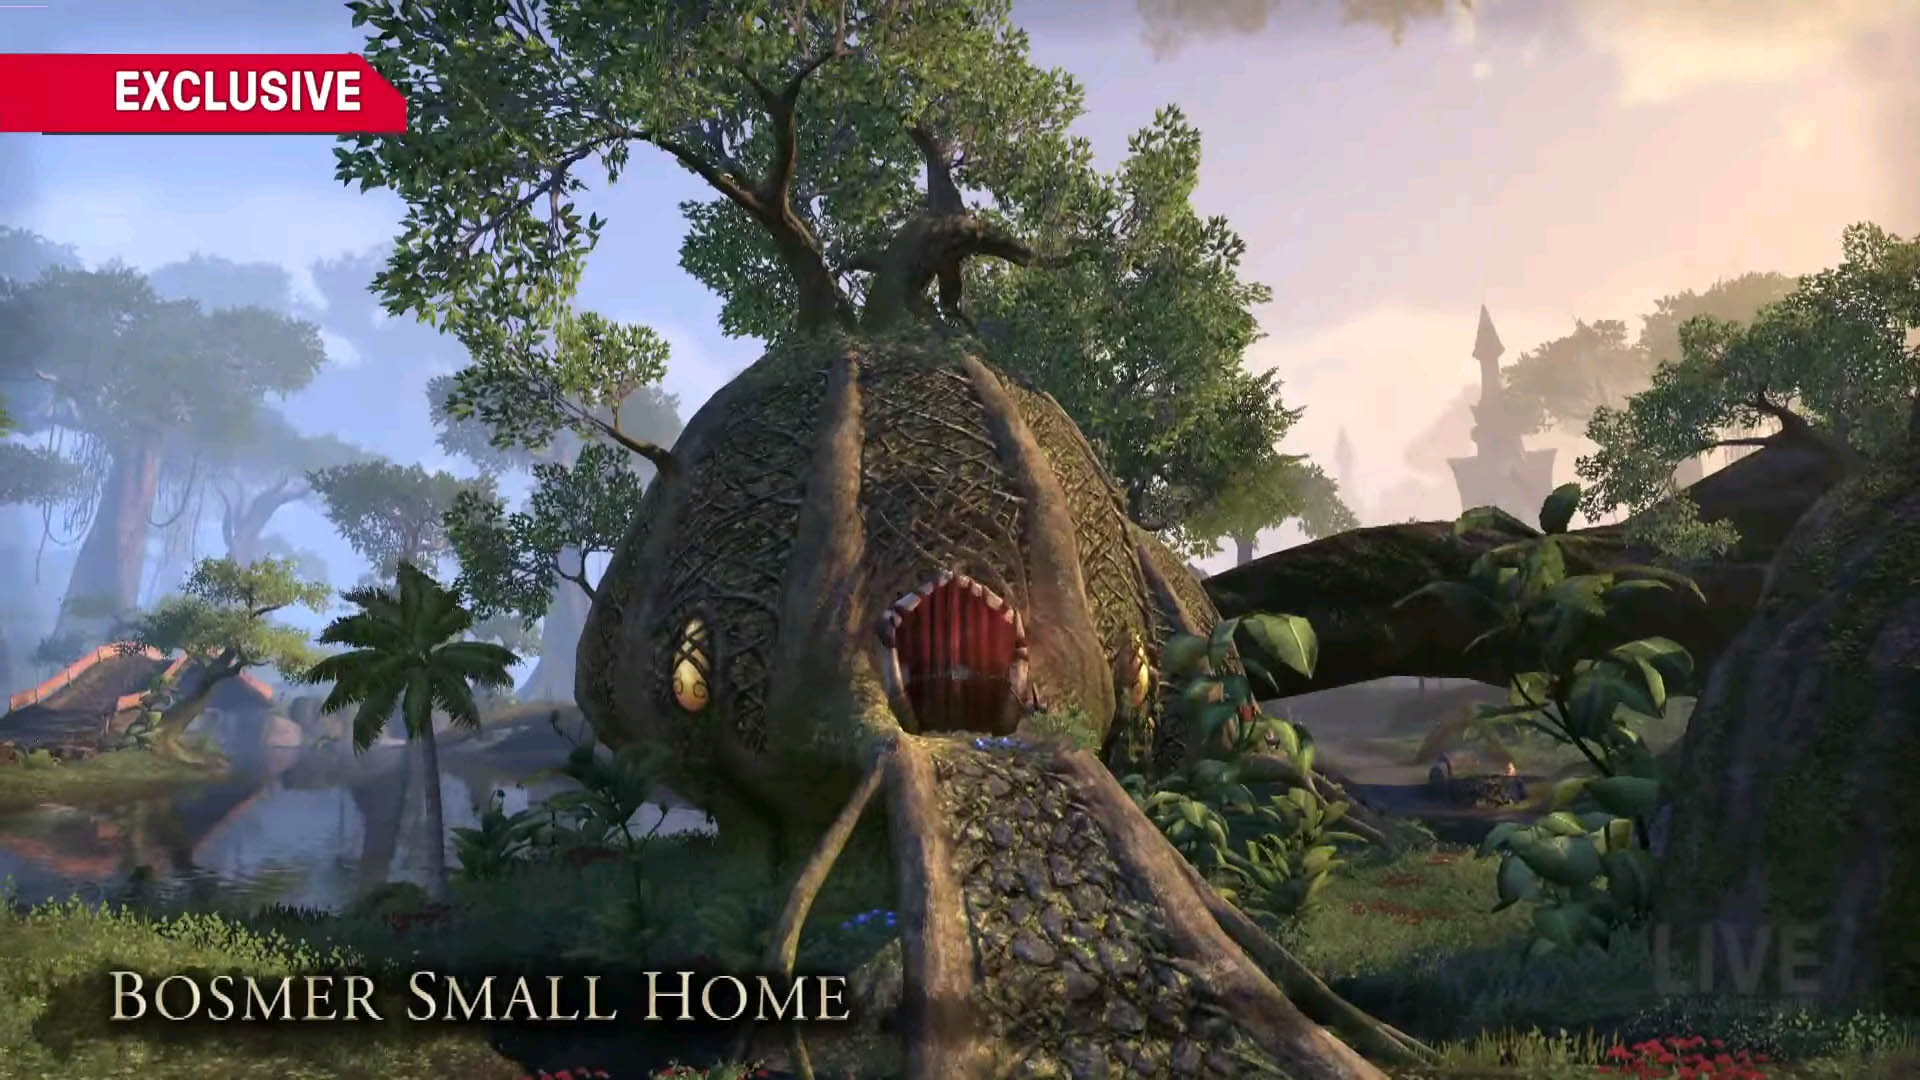 Bosmer_small_homeesohouses